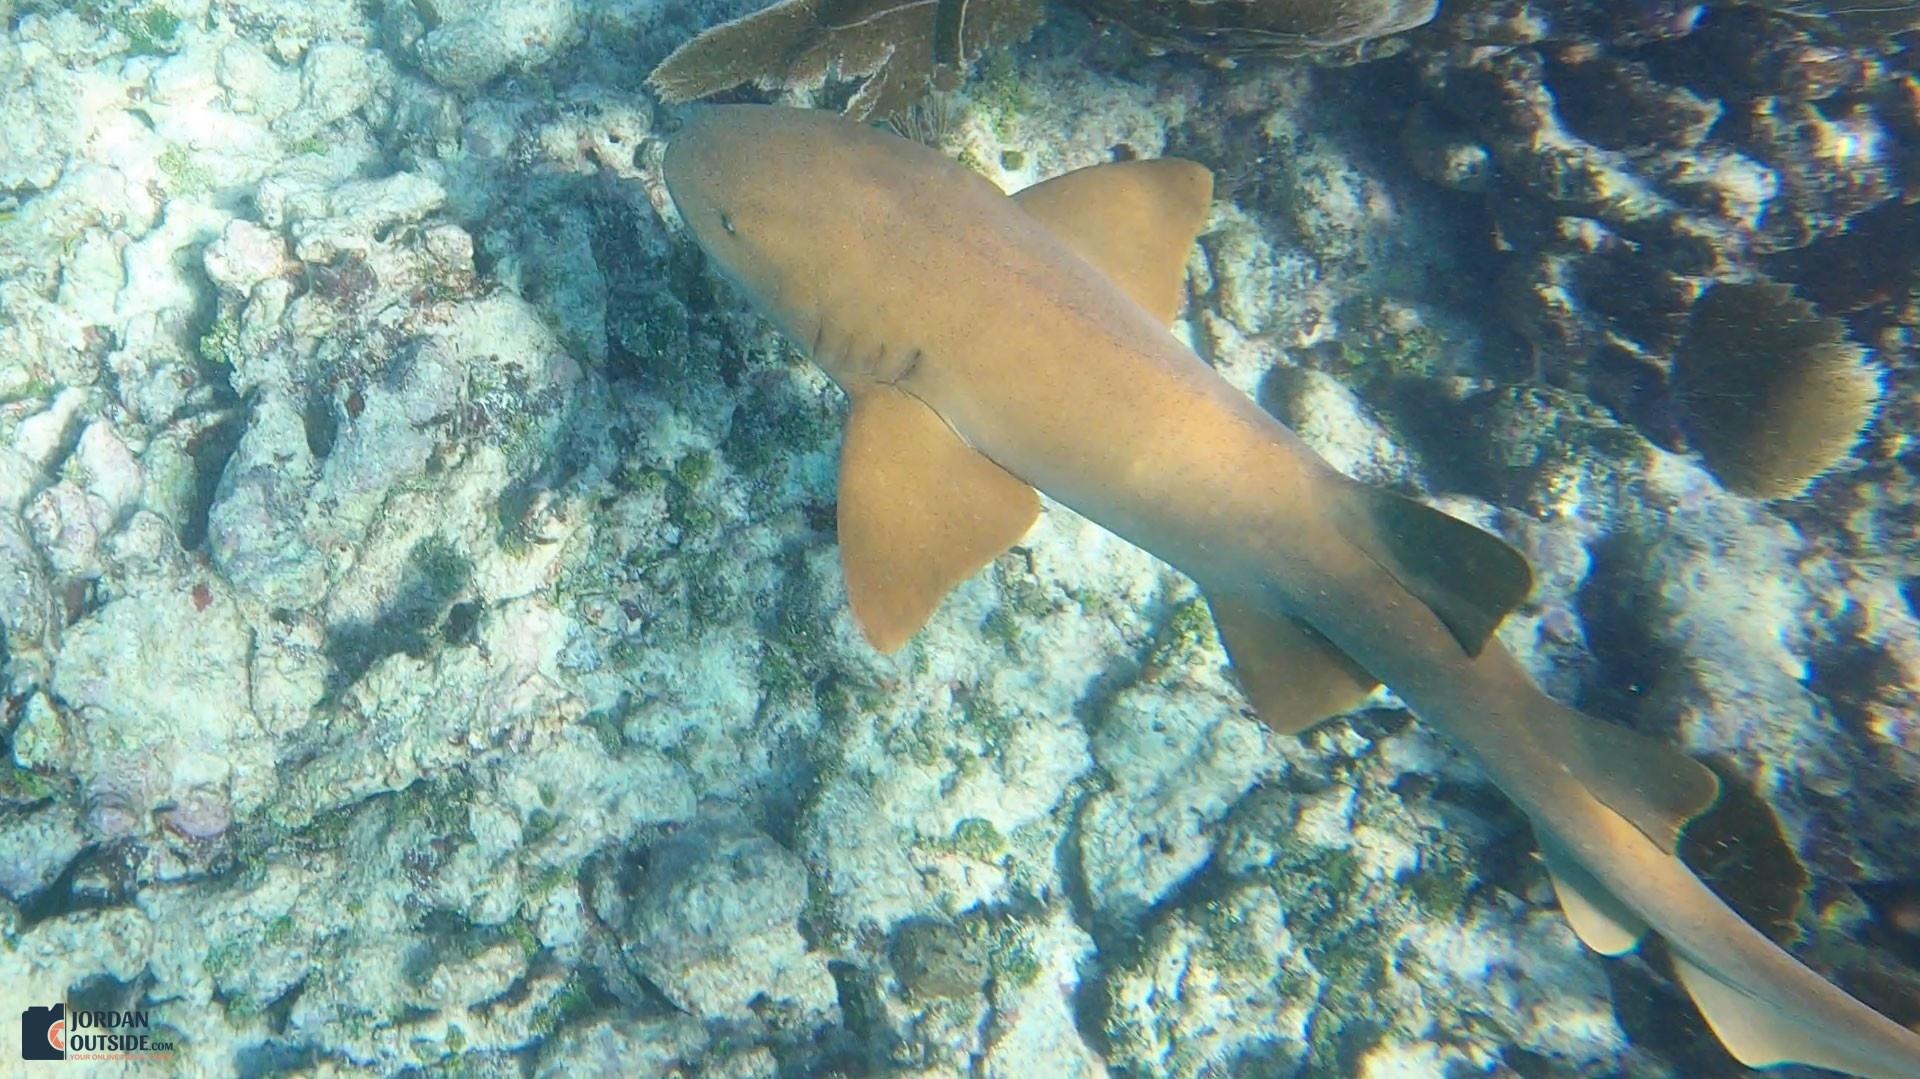 Reef Shark at the Grecian Rocks Coral Reef